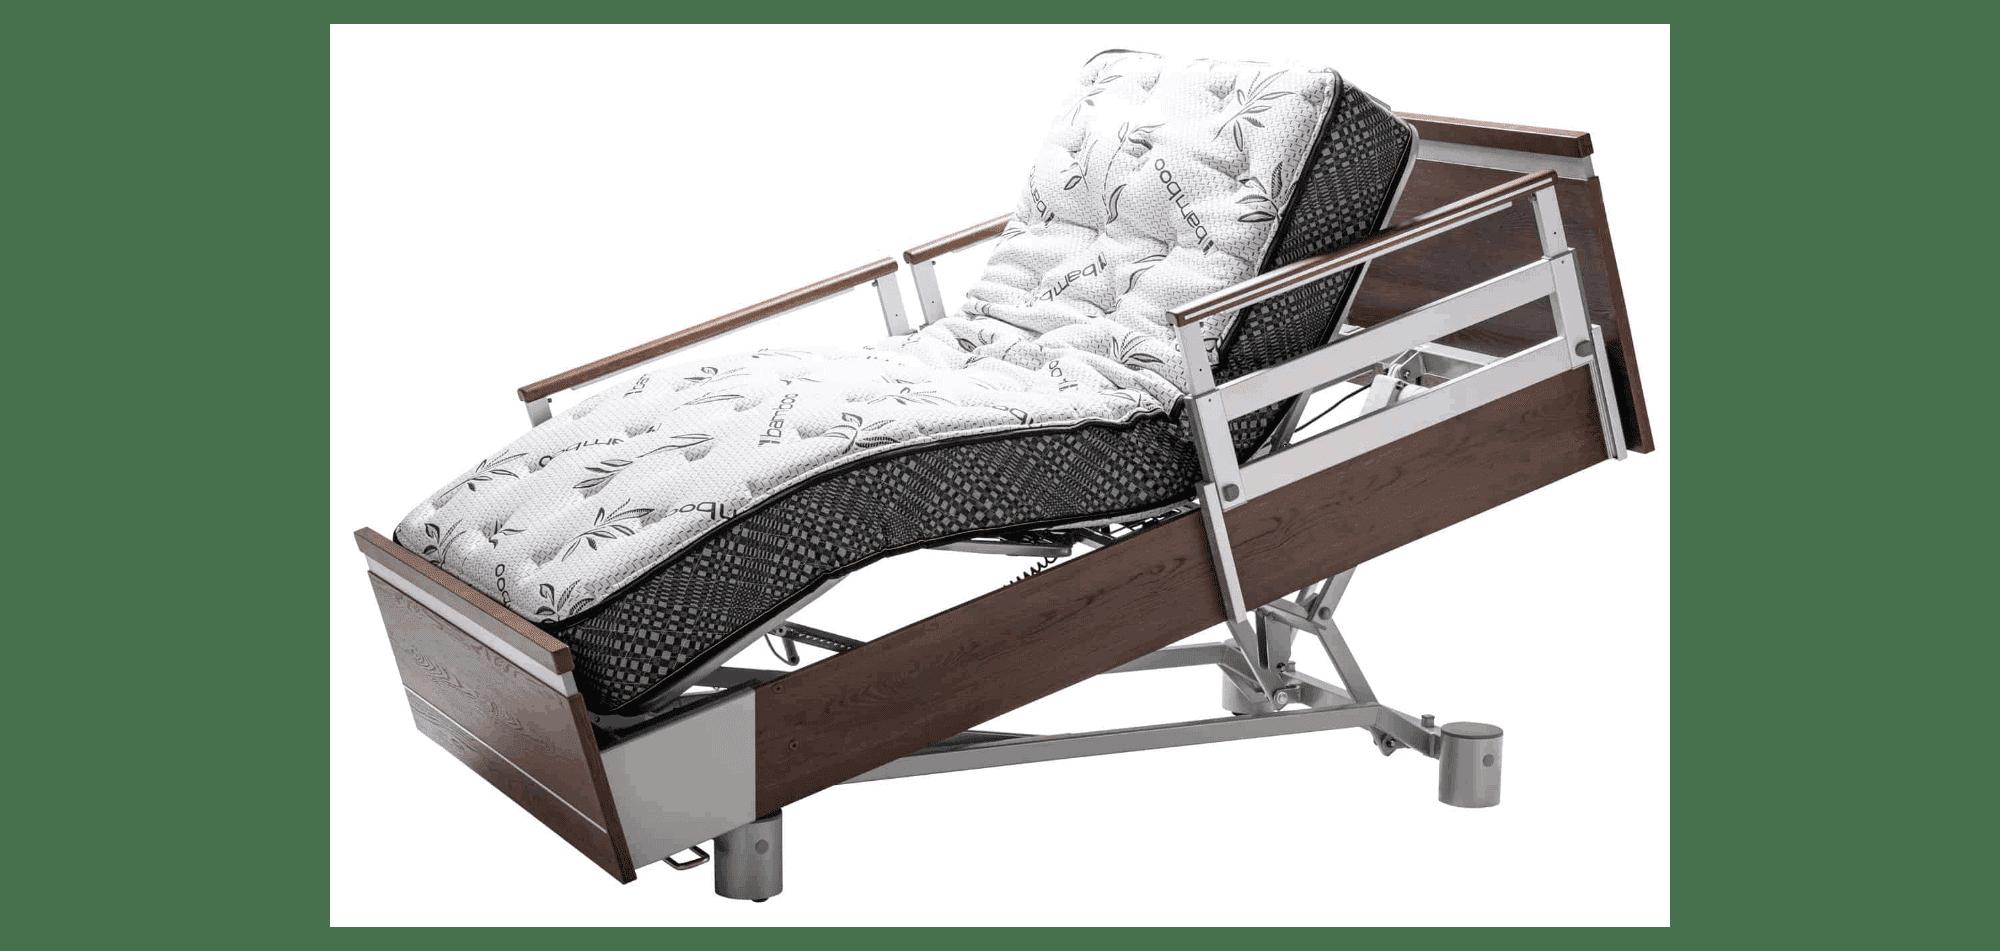 home hospital bed SonderCare Aura™ Premium Hospital Bed - Hospital Bed For Home Use - Premium Home Hospital Bed